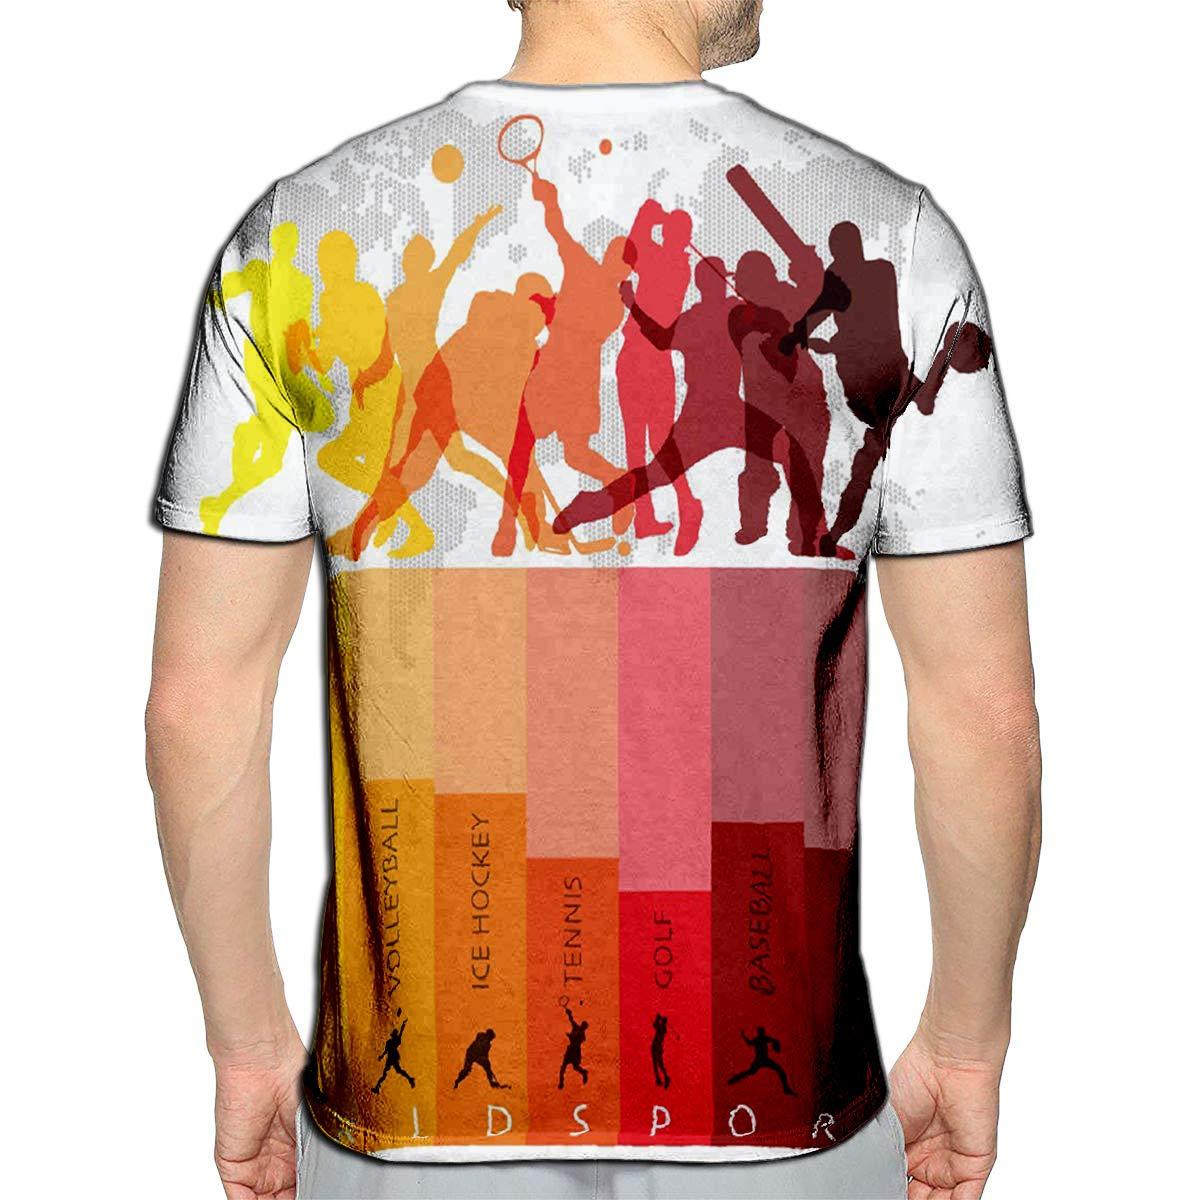 3D Printed T-Shirts Flamingo and Shapes Creative Kids Texture Short Sleeve Tops Tees